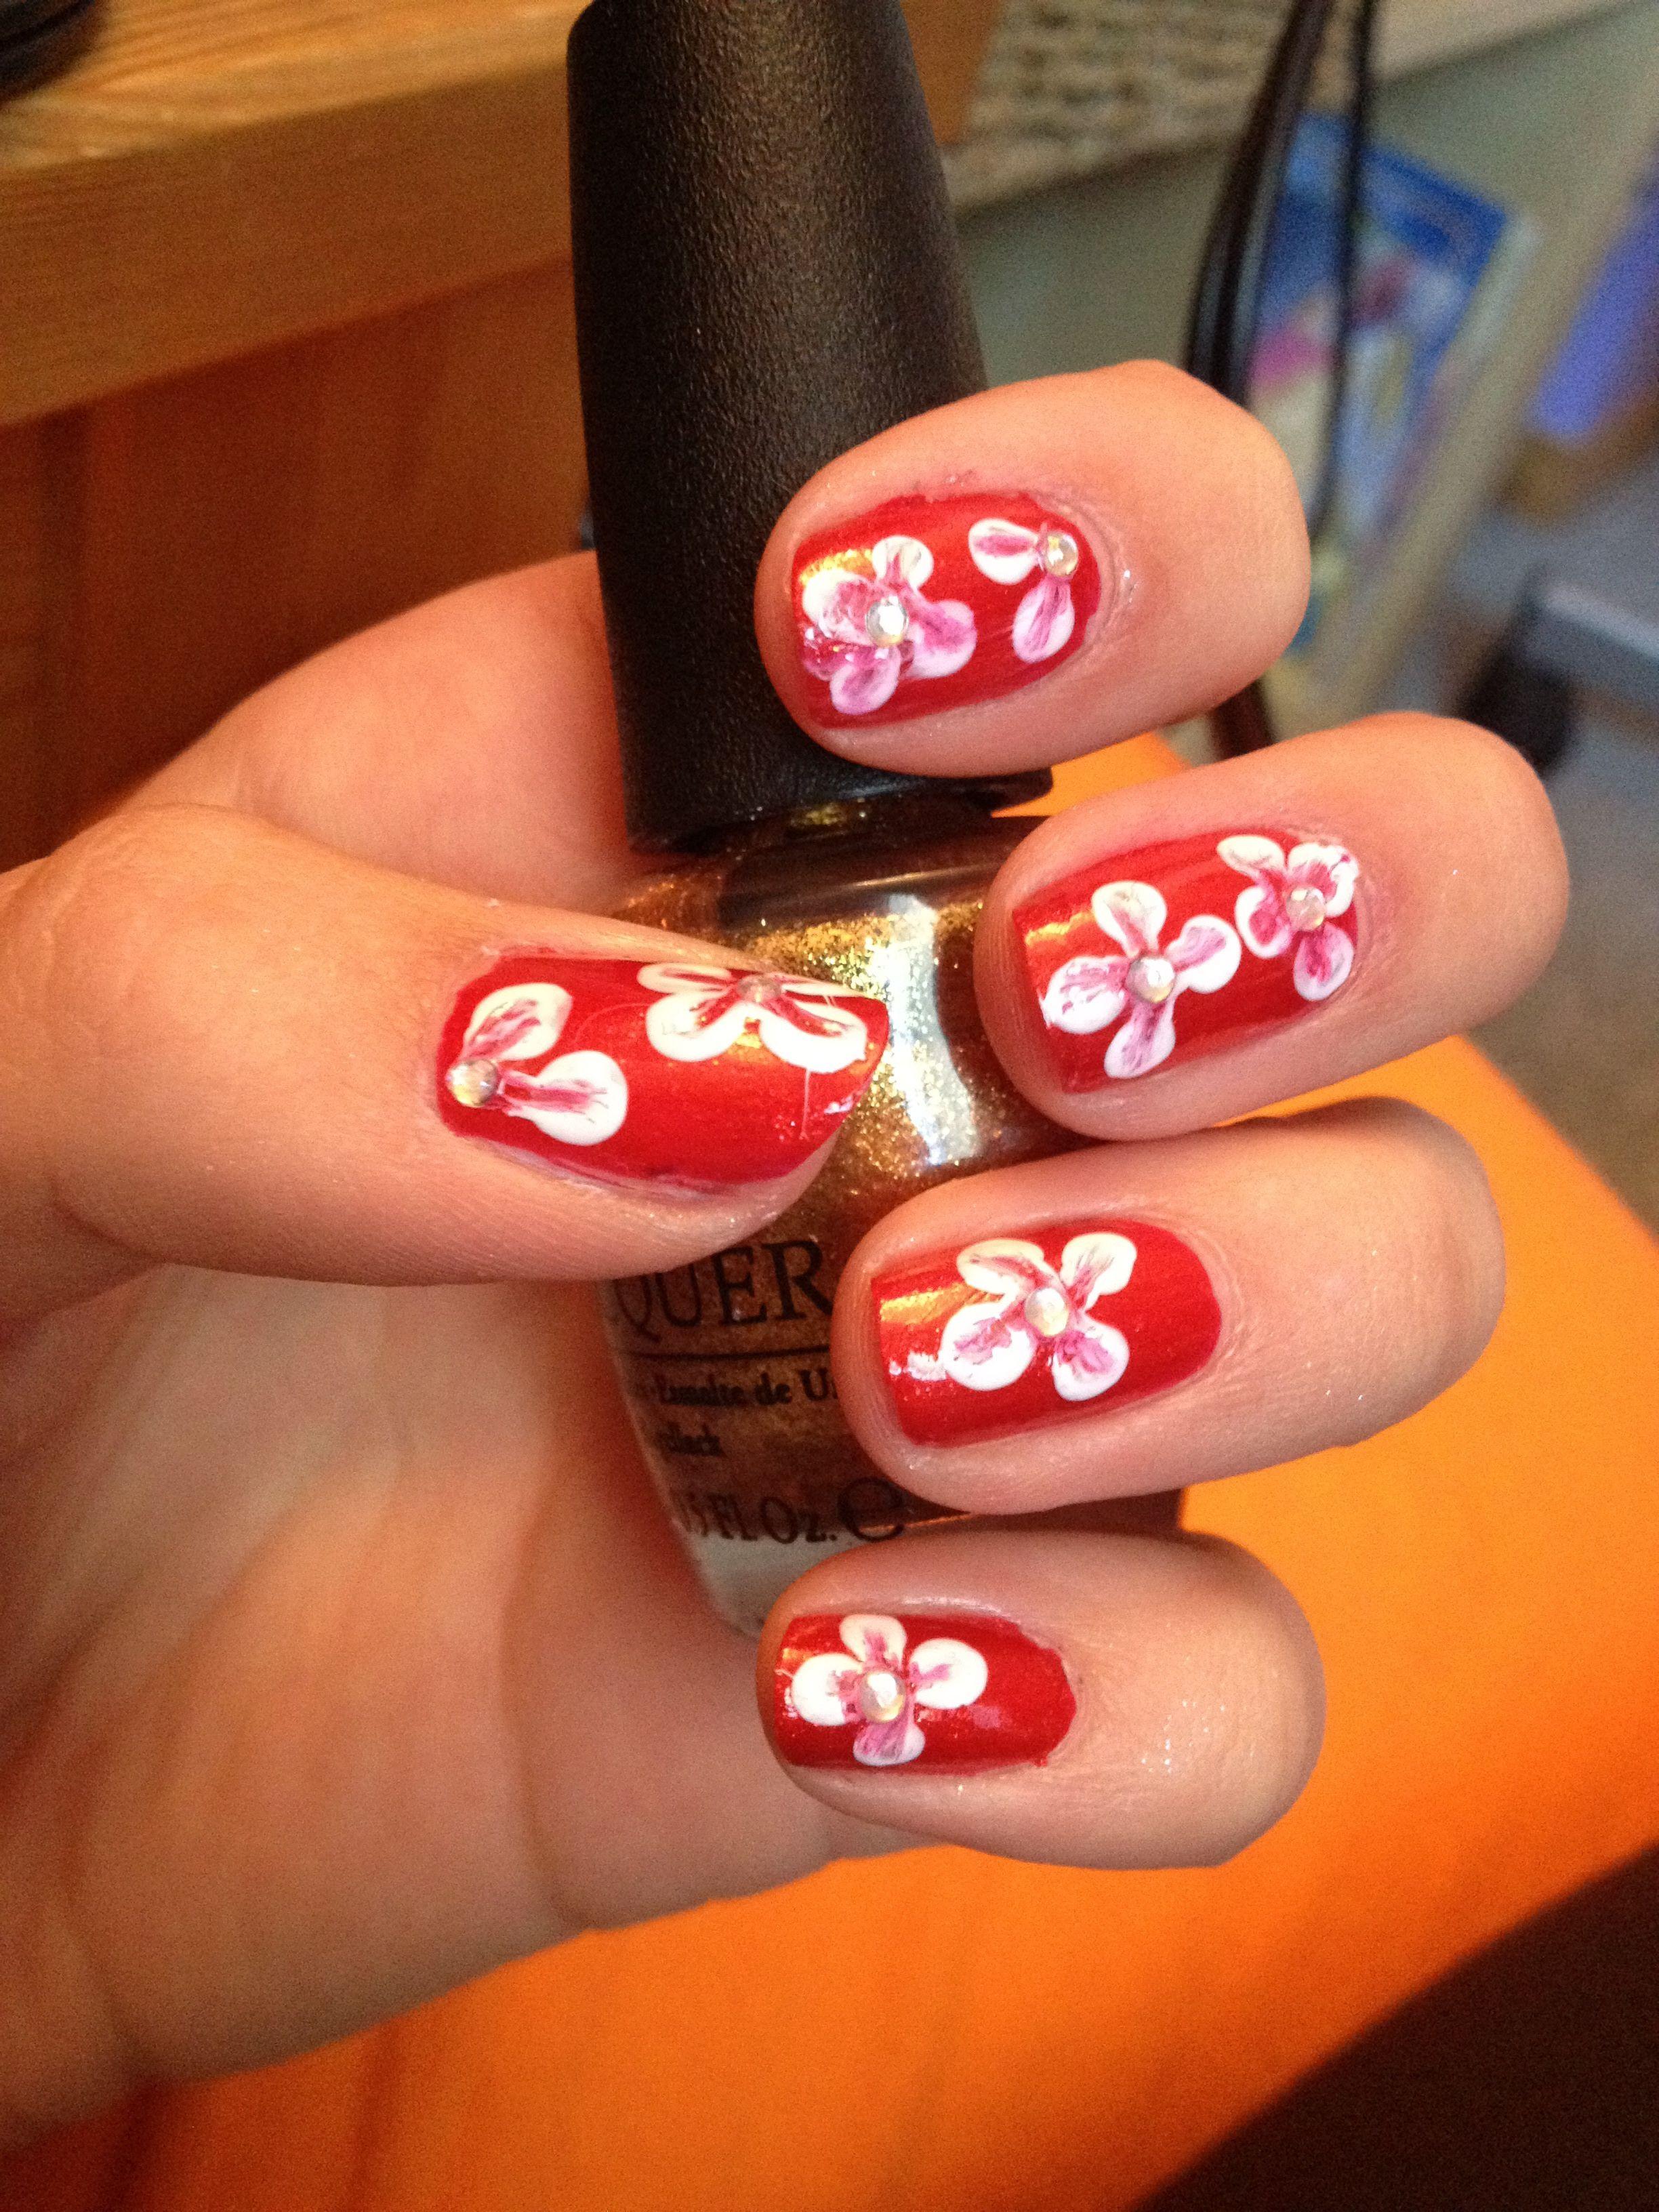 Nailhawaiianflowers hawaiian flower nail art nails nail nailhawaiianflowers hawaiian flower nail art nails izmirmasajfo